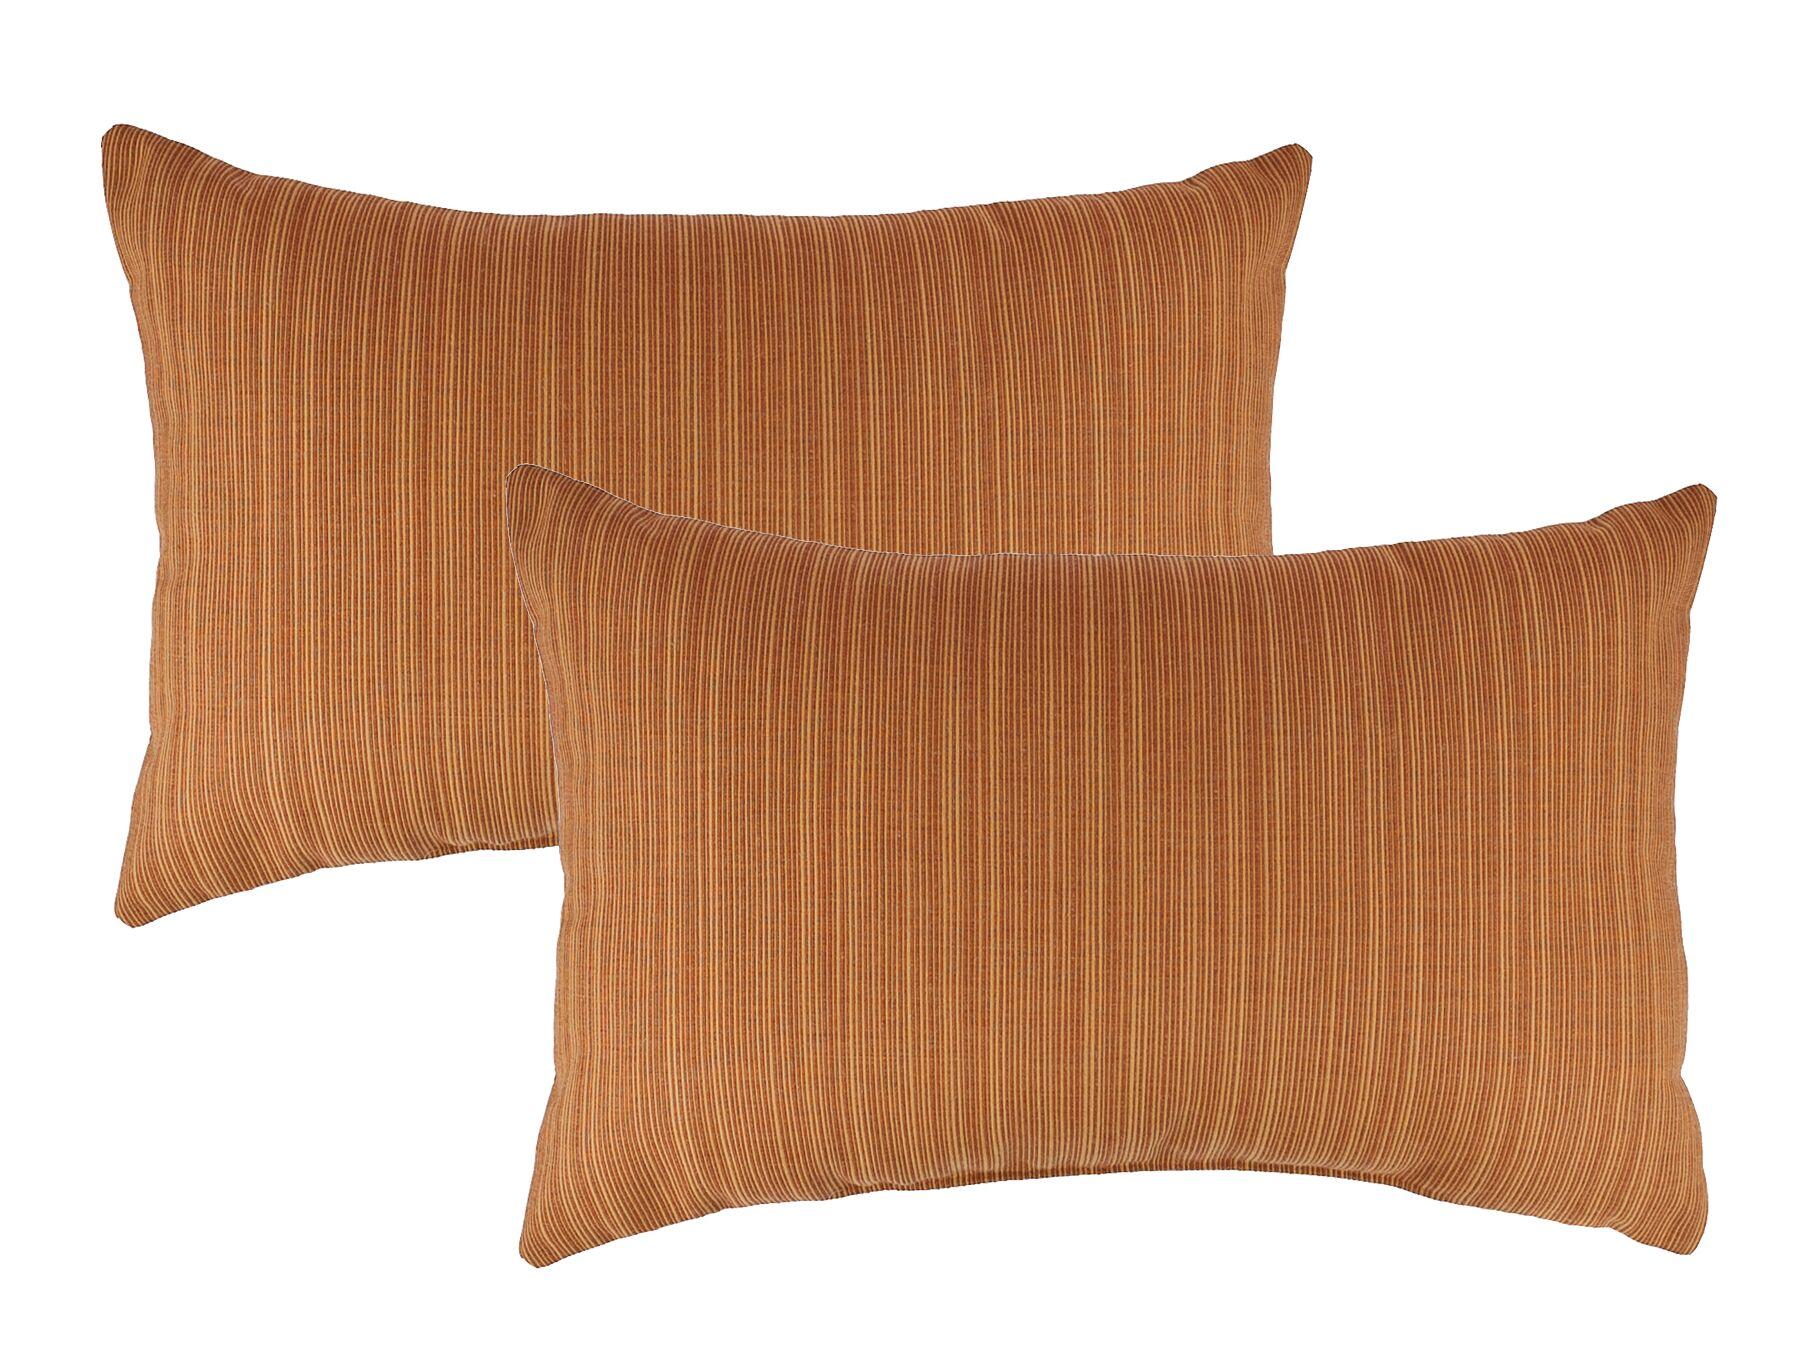 Dupione Outdoor Sunbrella Lumbar Pillow